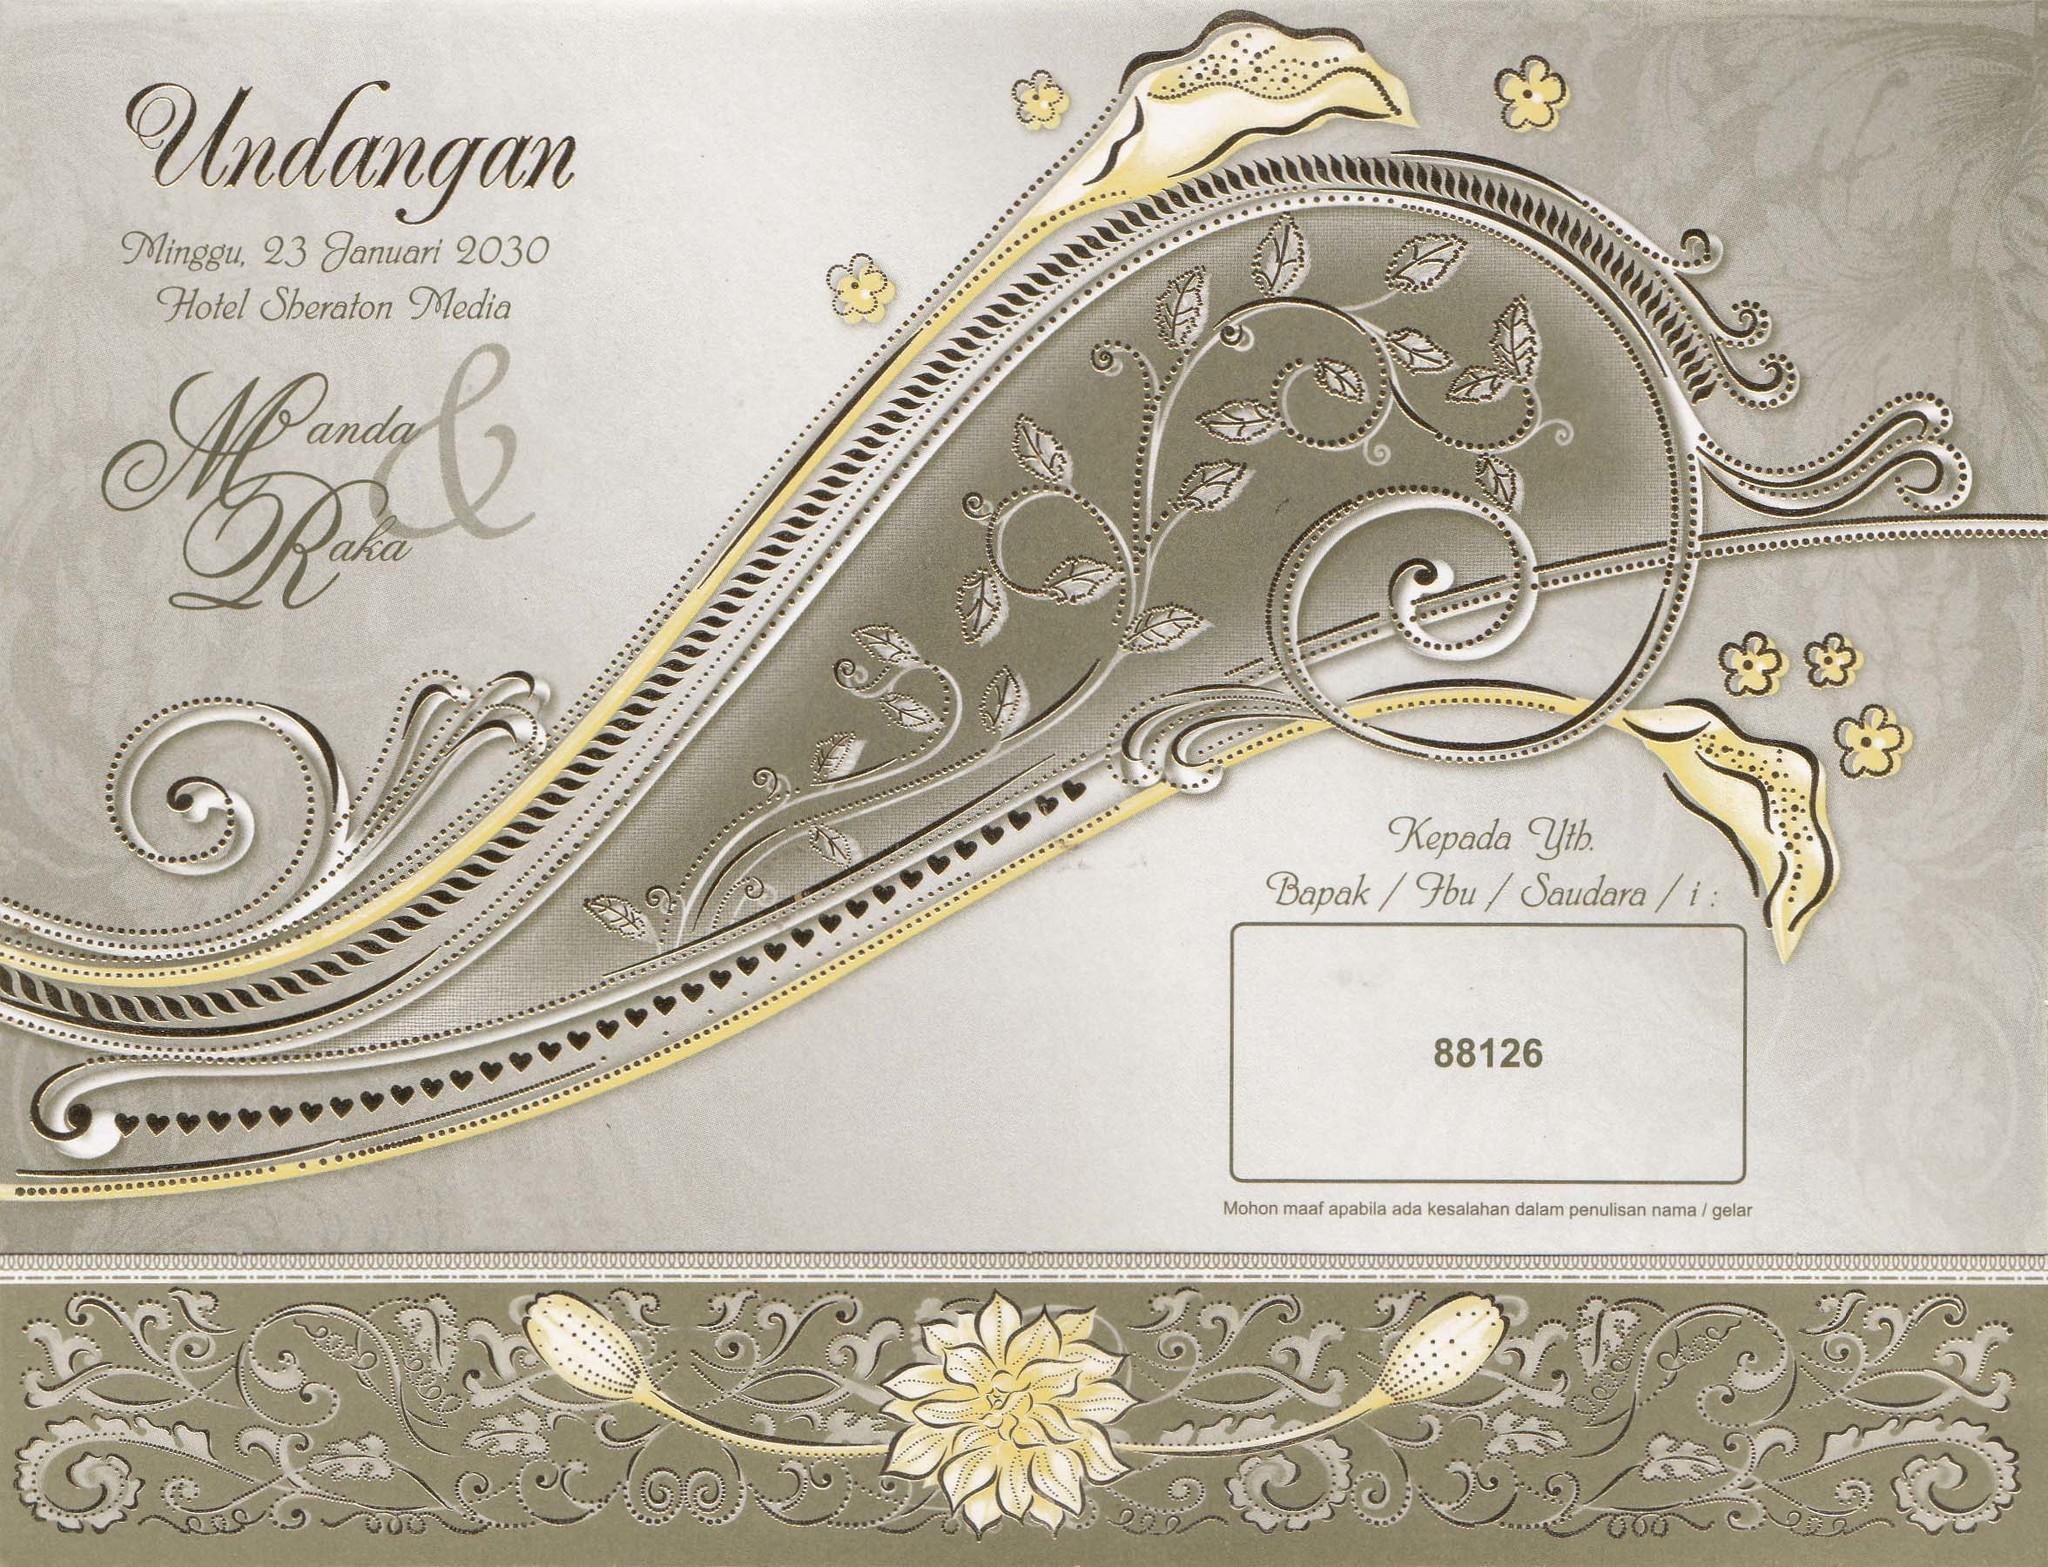 Jual Cetak Undangan Pernikahan Erba 88126 Kreatif Digital